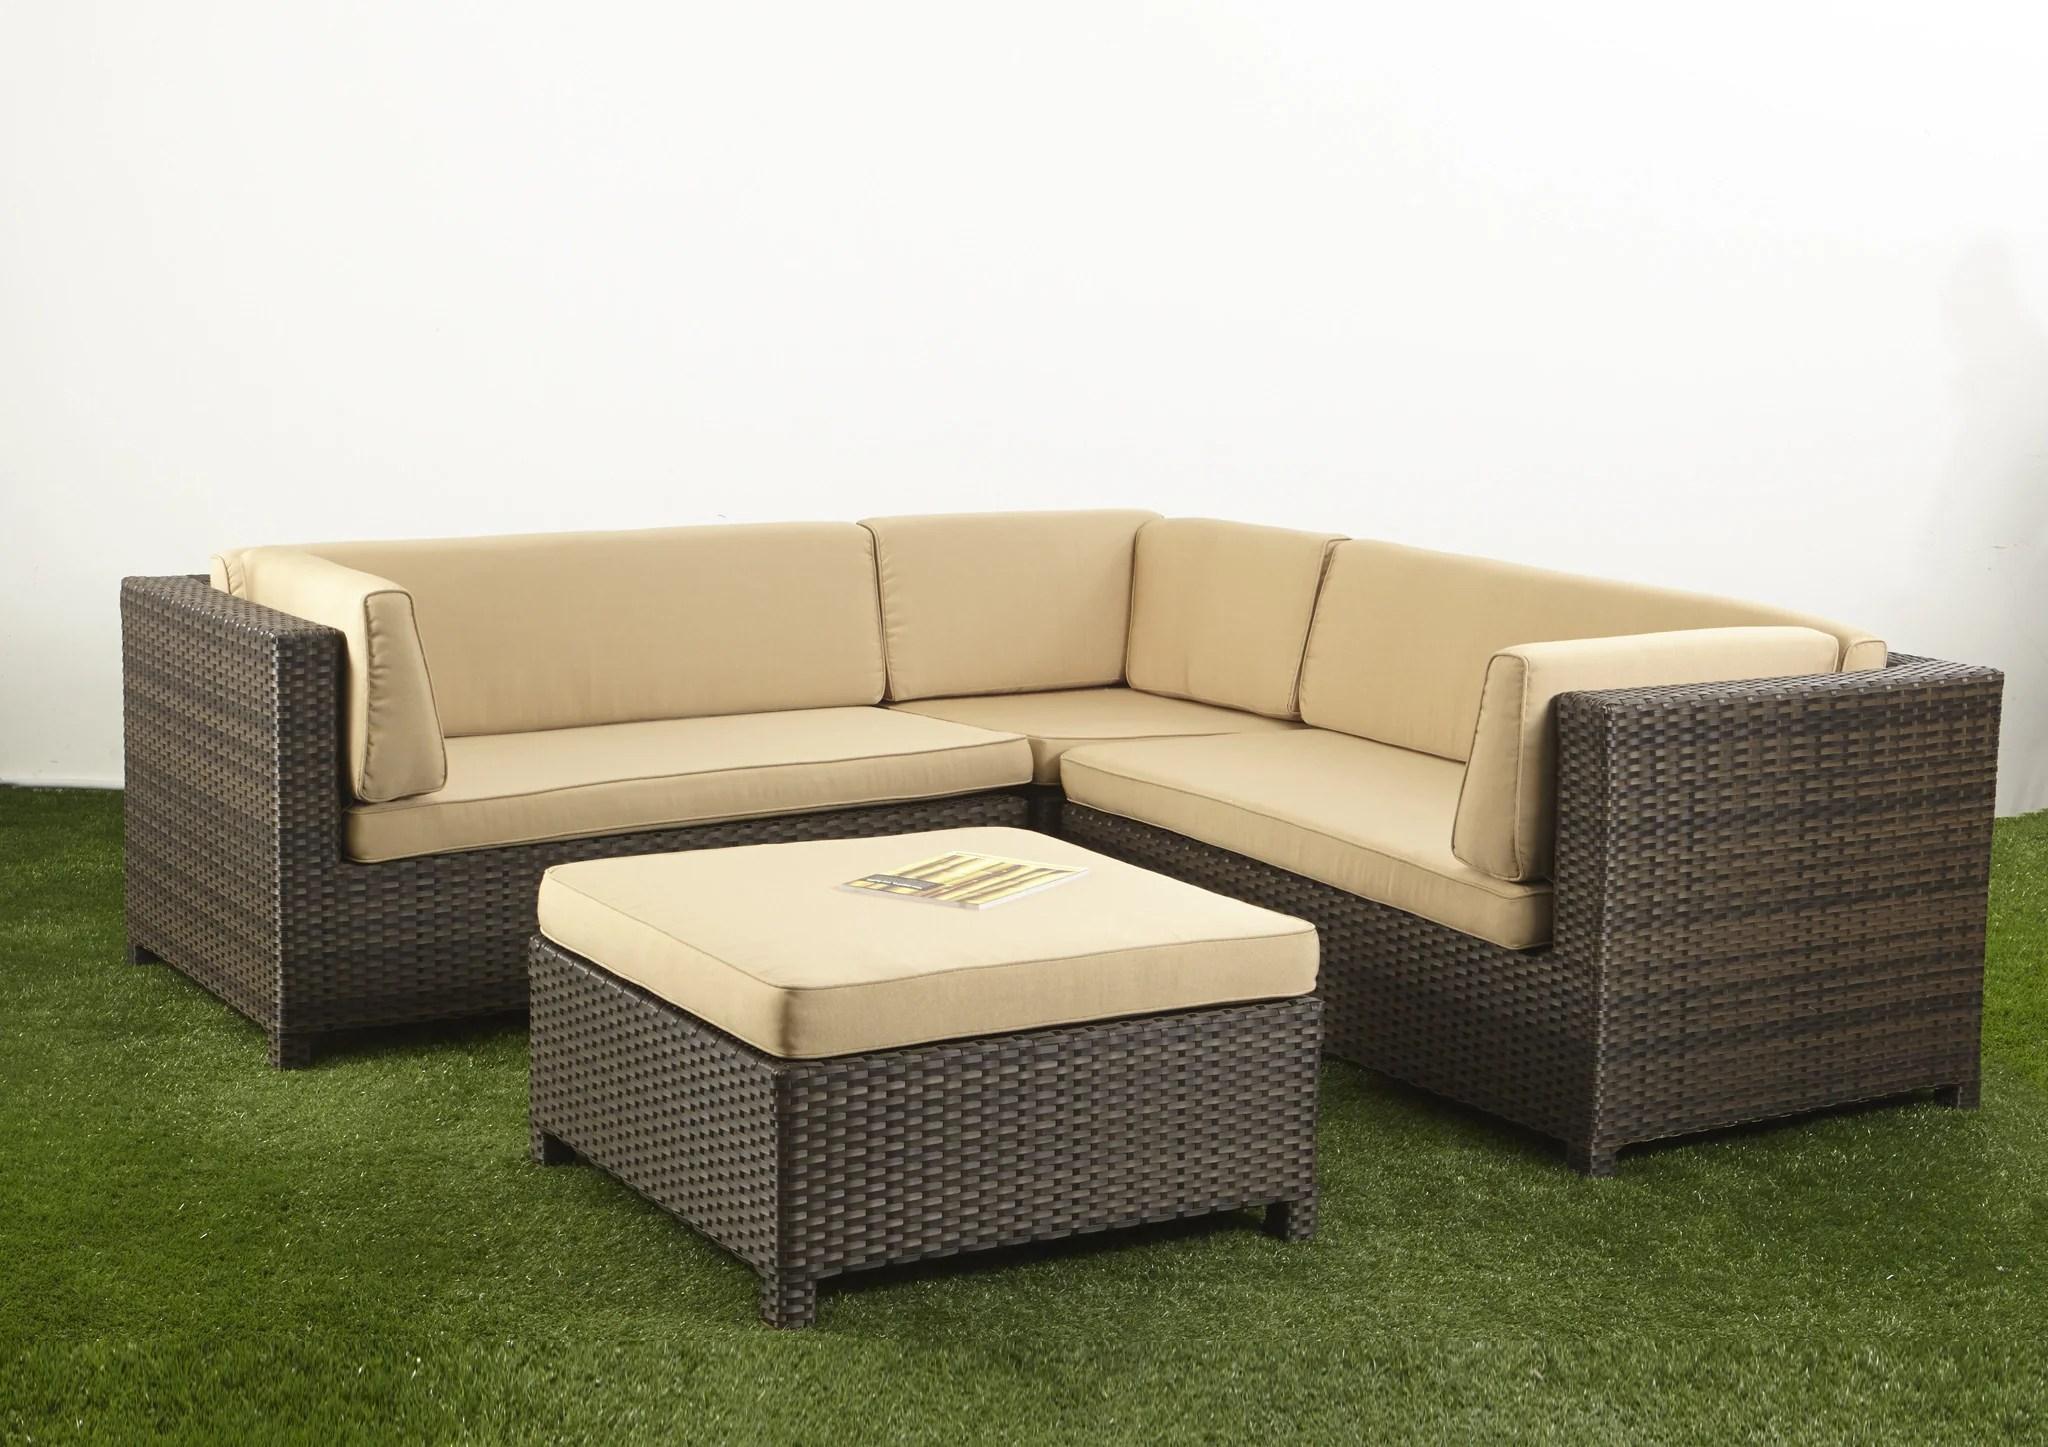 bali sofa lounger s c leather sofas l shape modular lounge set boulevard outdoor